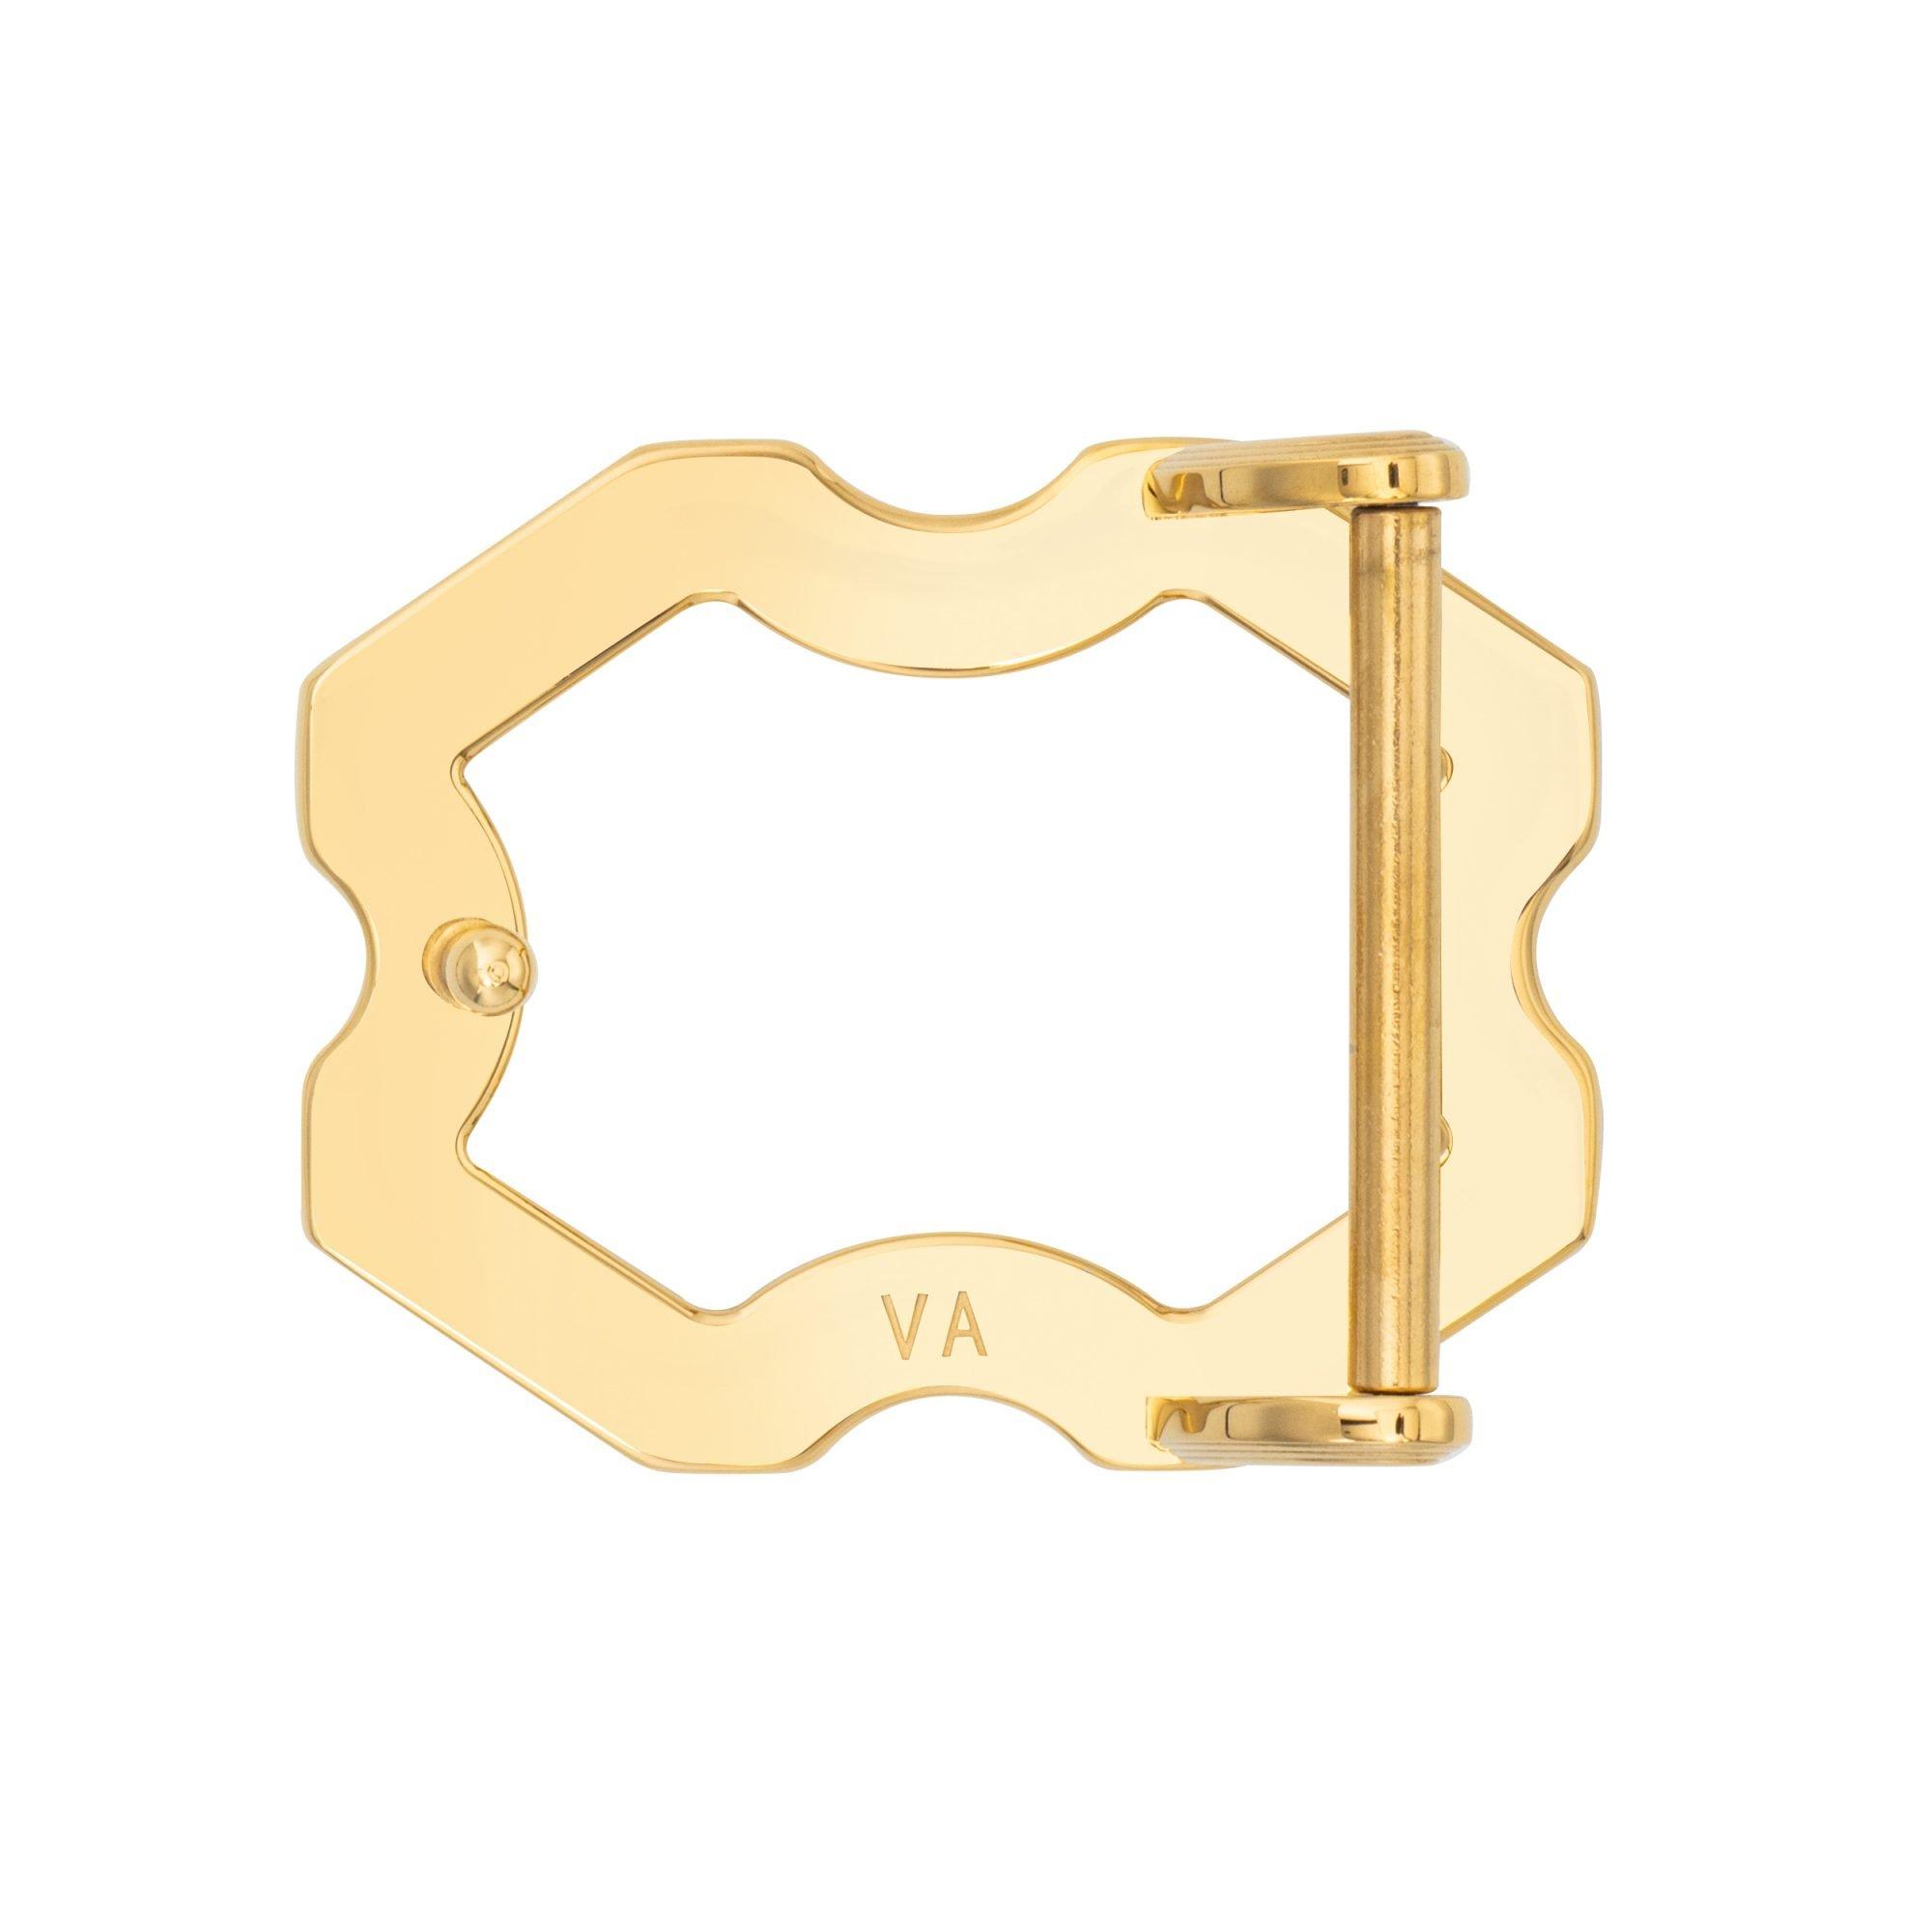 VIKTOR ALEXANDER 38MM STAINLESS STEEL BELT BUCKLE X FRAME INDENTED YELLOW GOLD BACK PROFILE